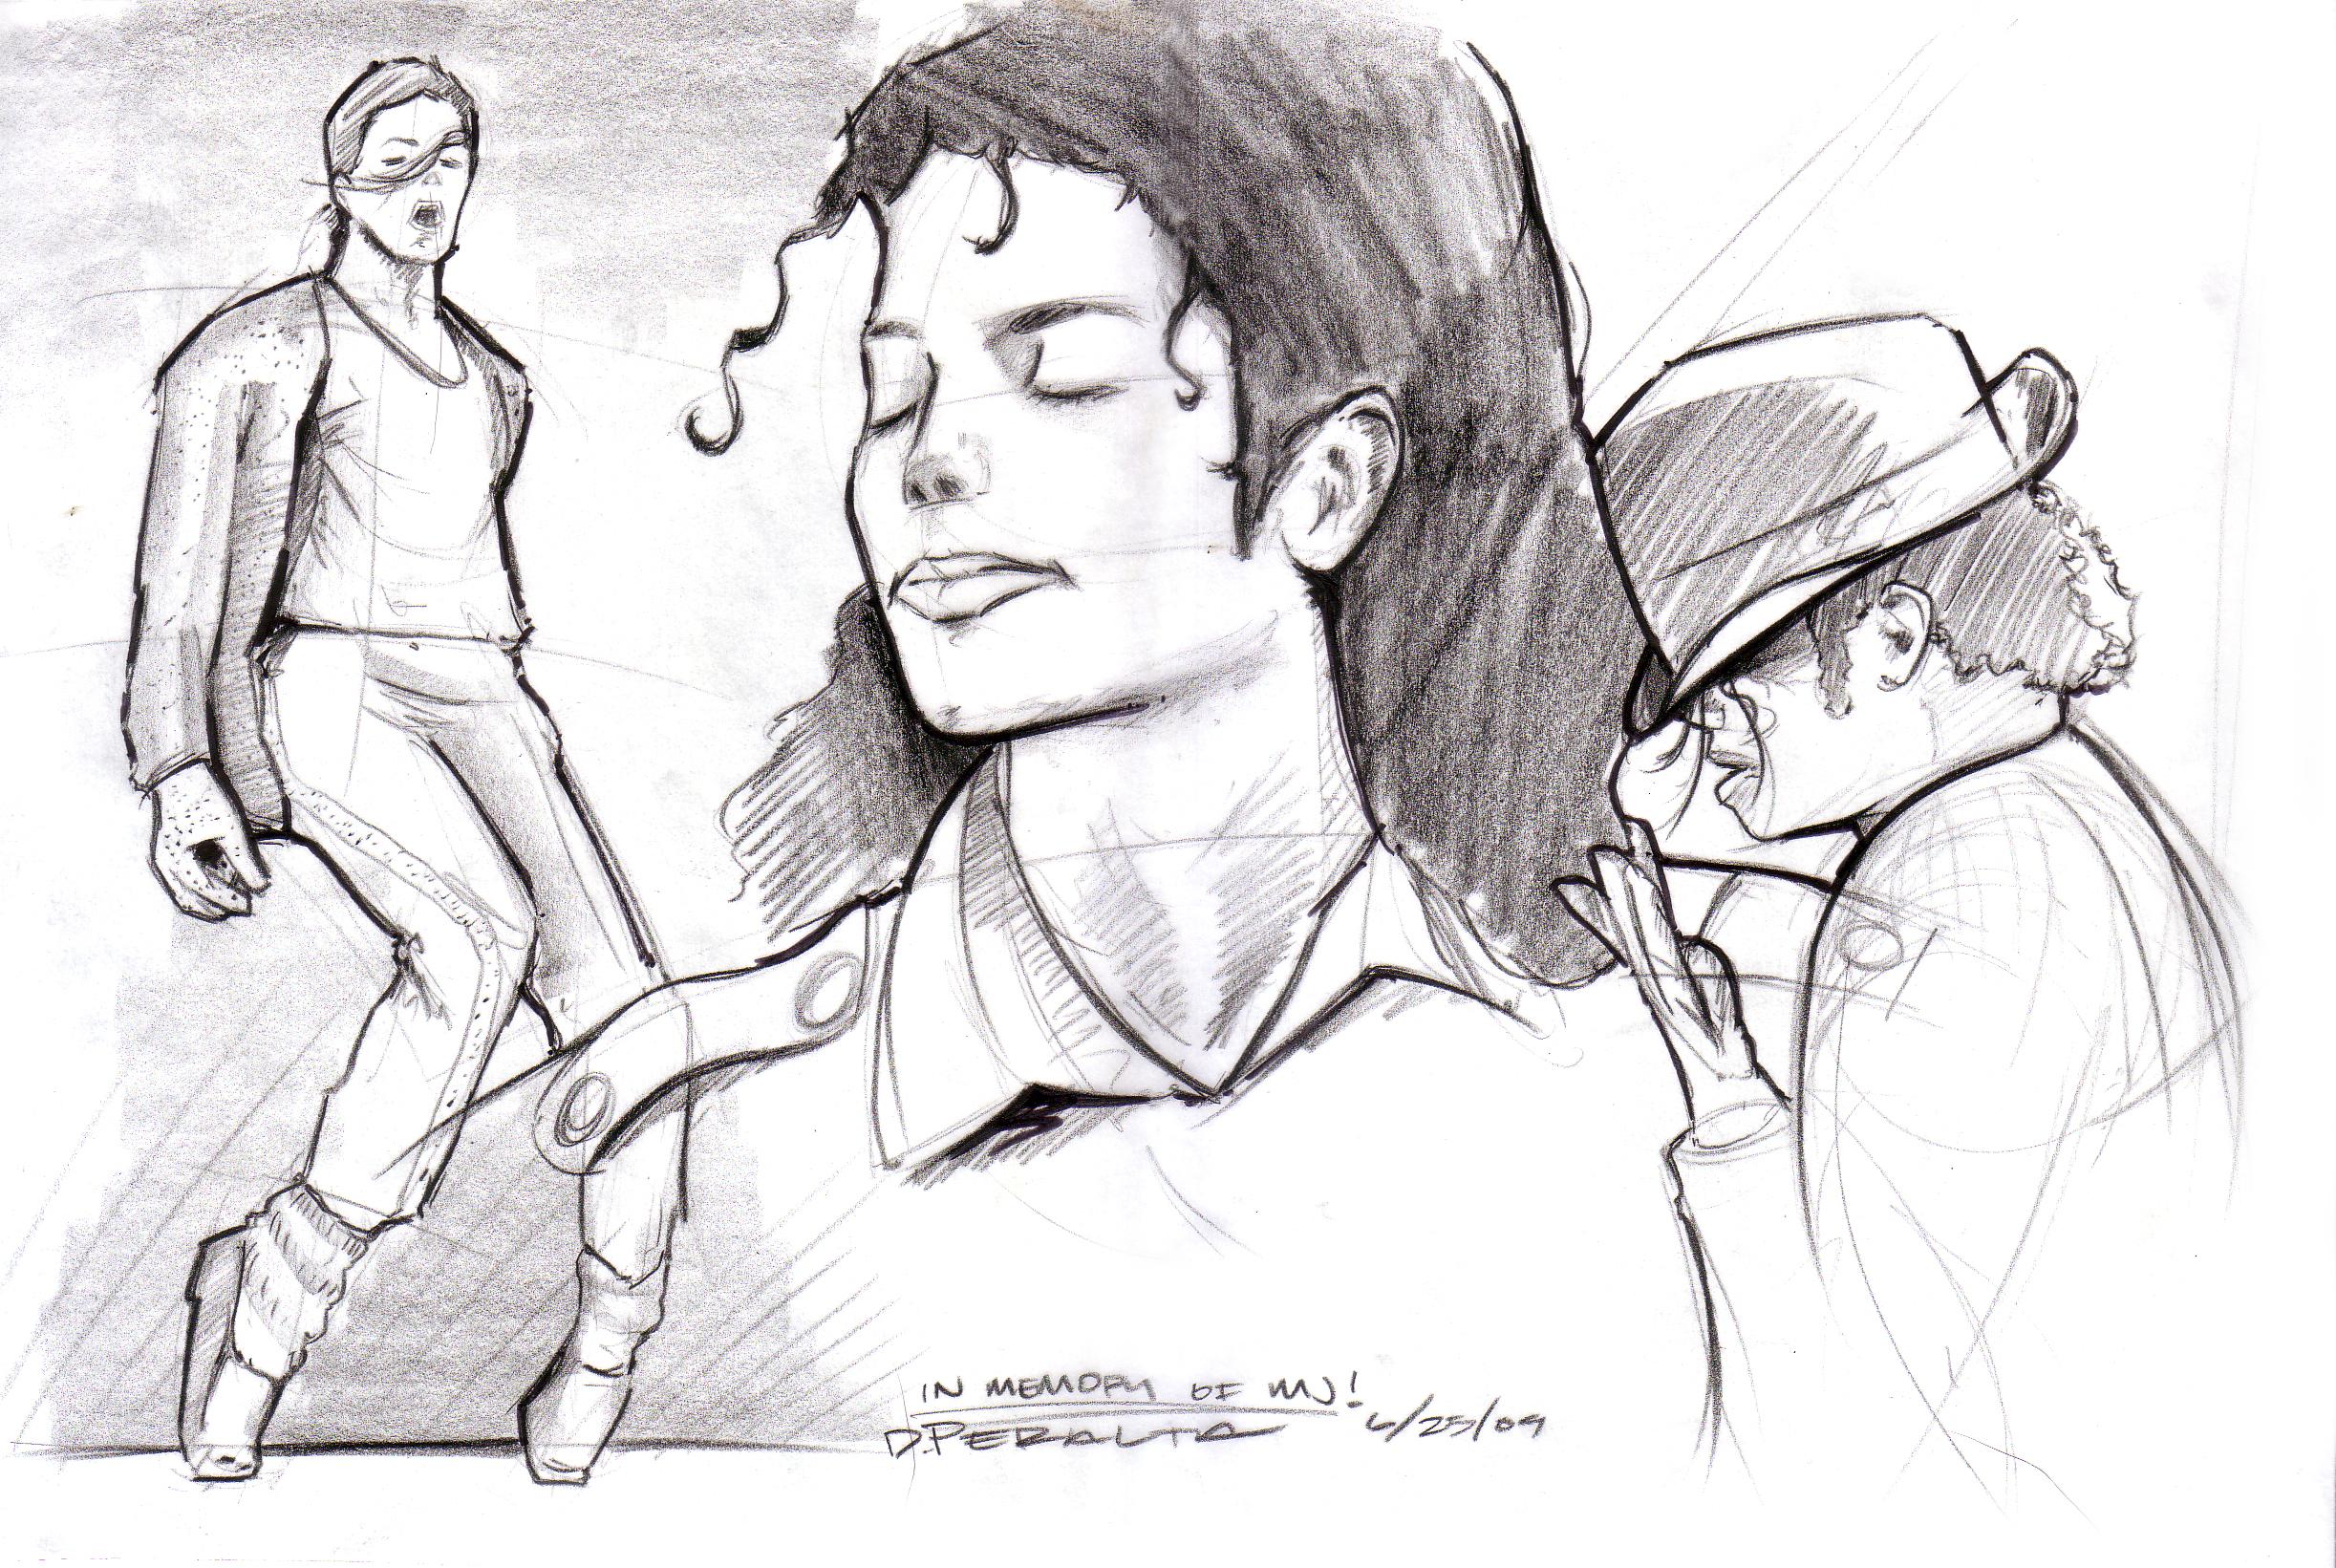 In Memory of Michael Jackson